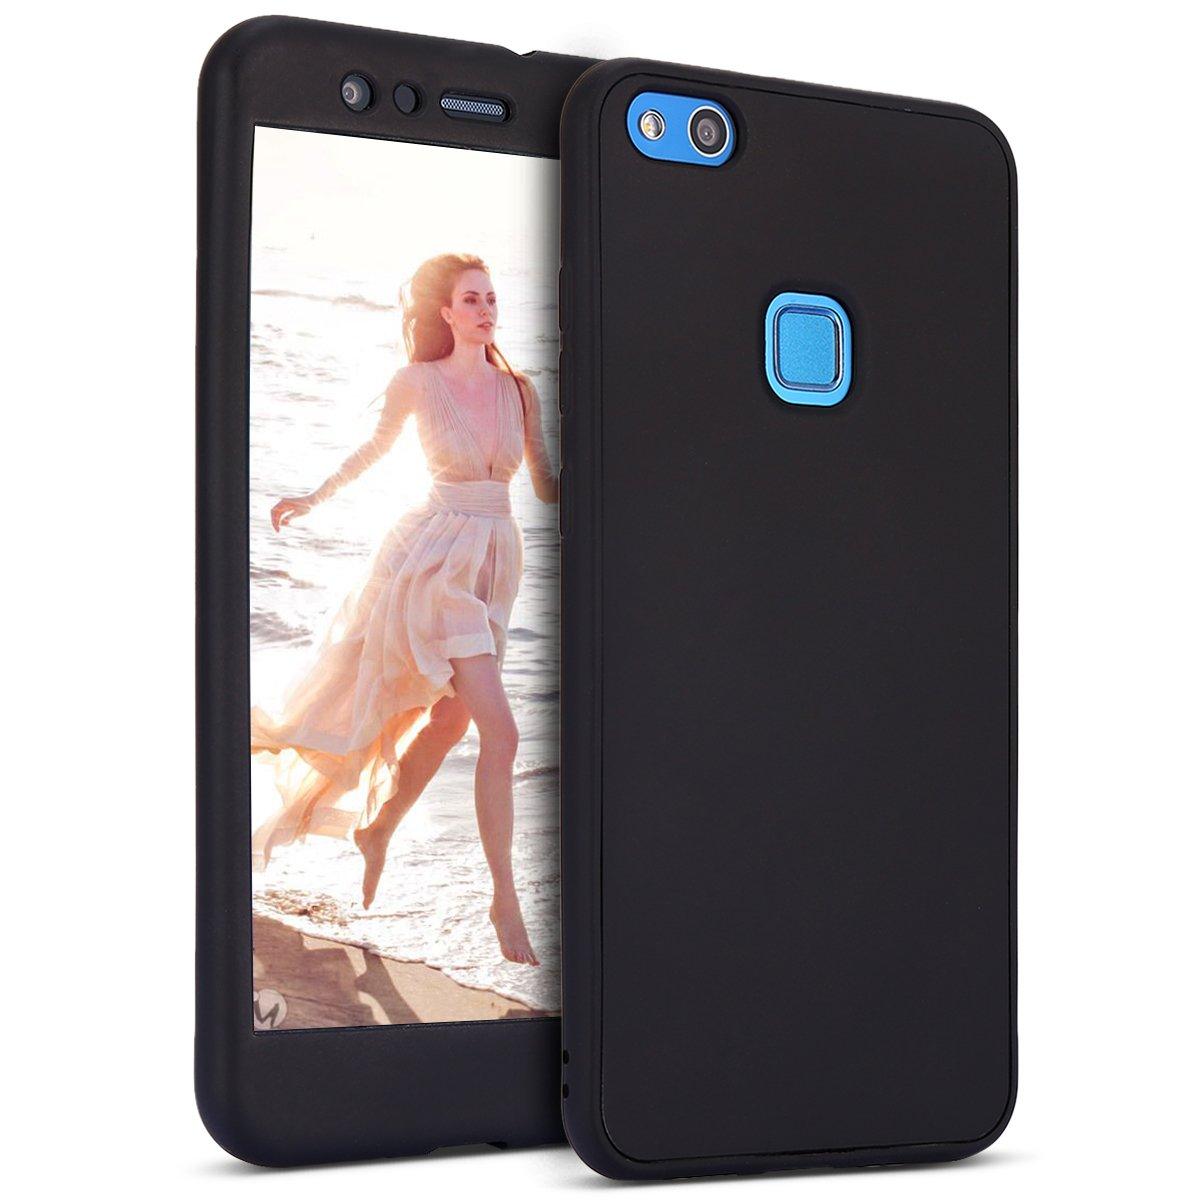 Ukayfe Custodia Huawei P10 Lite,Cover Huawei P10 Lite 360 Gradi,Full Body 2 in 1 Cover in Silicone TPU Cover in Gomma Flessibile Protettiva Cover Custodia per Huawei P10 Lite.Oro